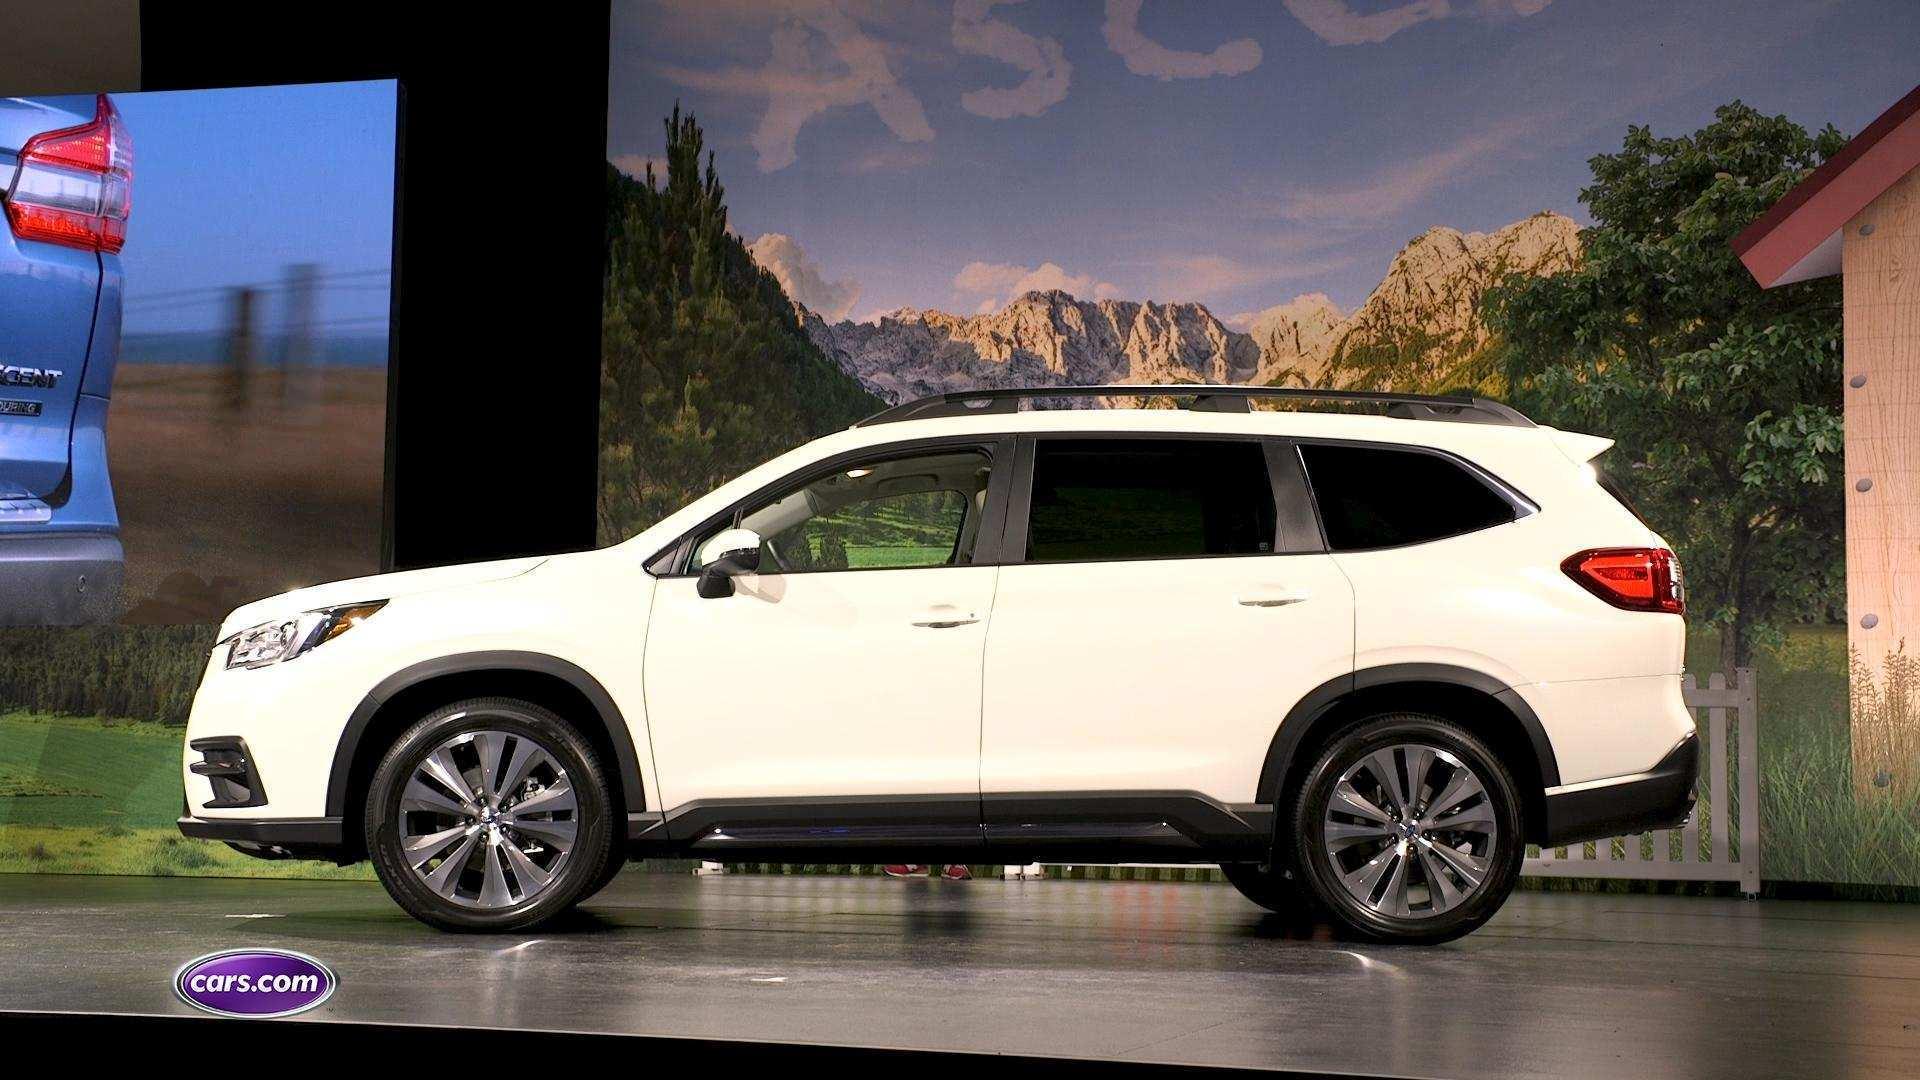 26 The 2019 Subaru Ascent Video New Concept for 2019 Subaru Ascent Video